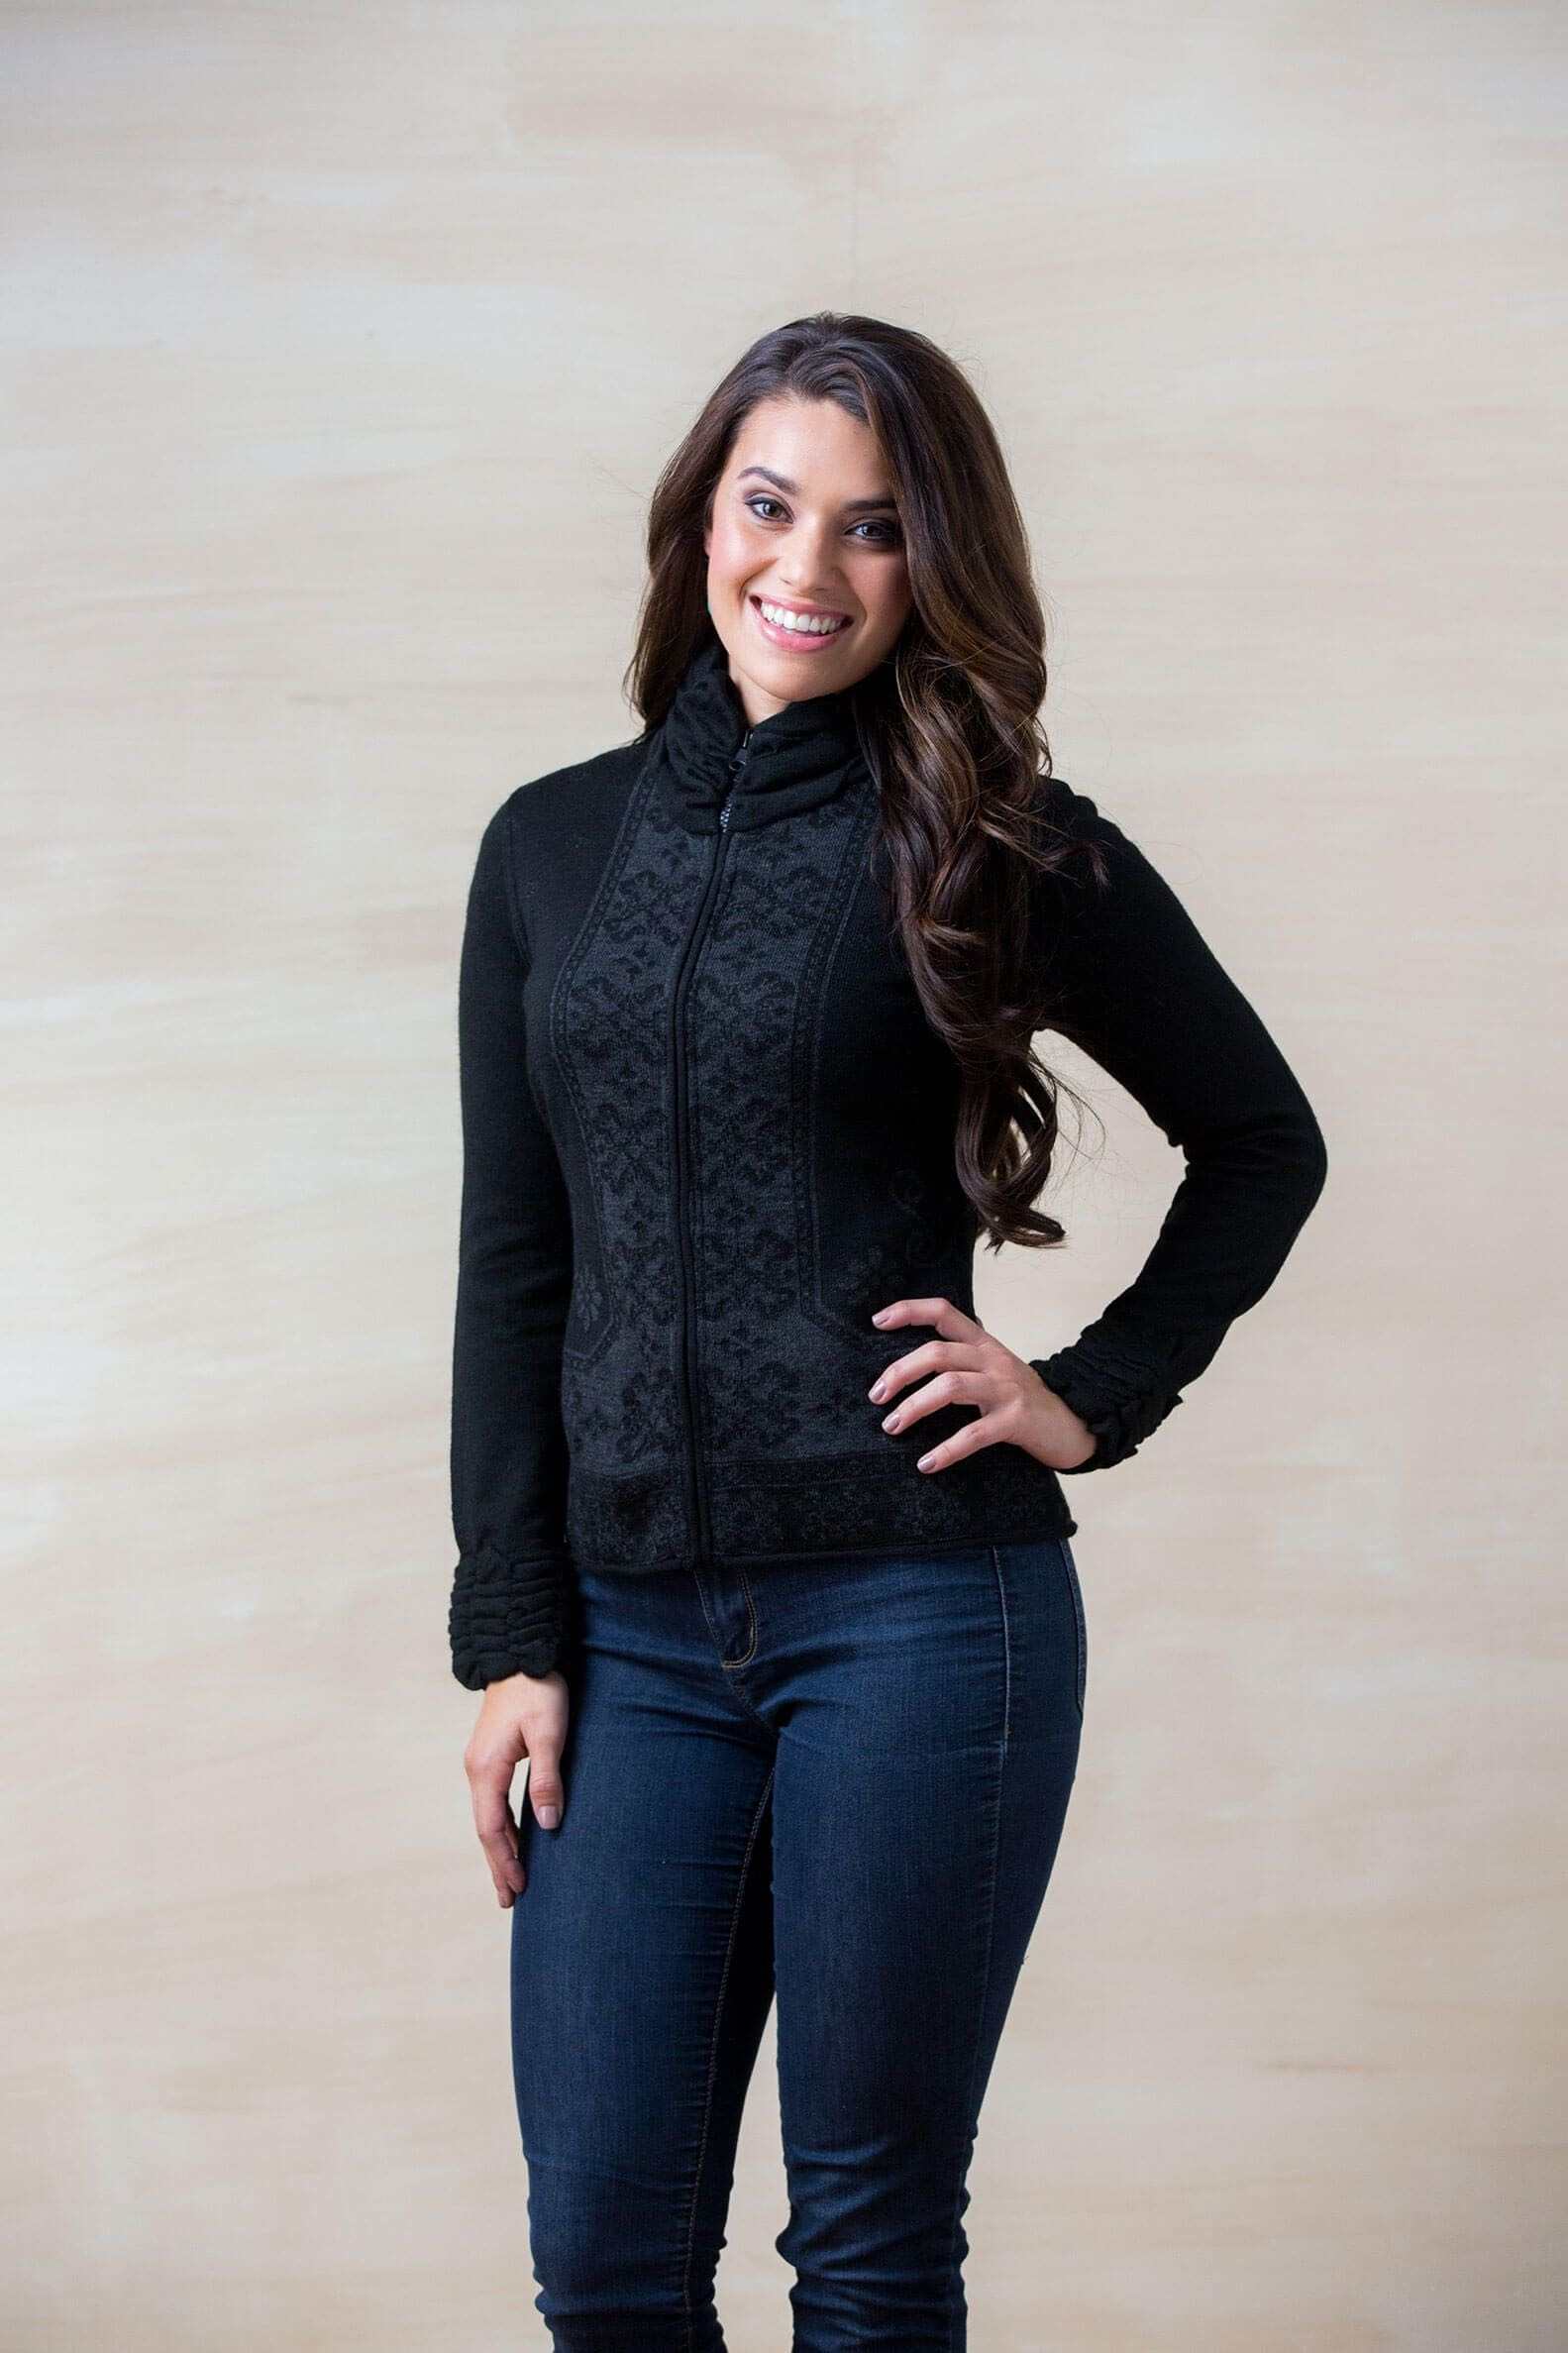 Karita Sweater from Sheepskin & Alpaca Specialties